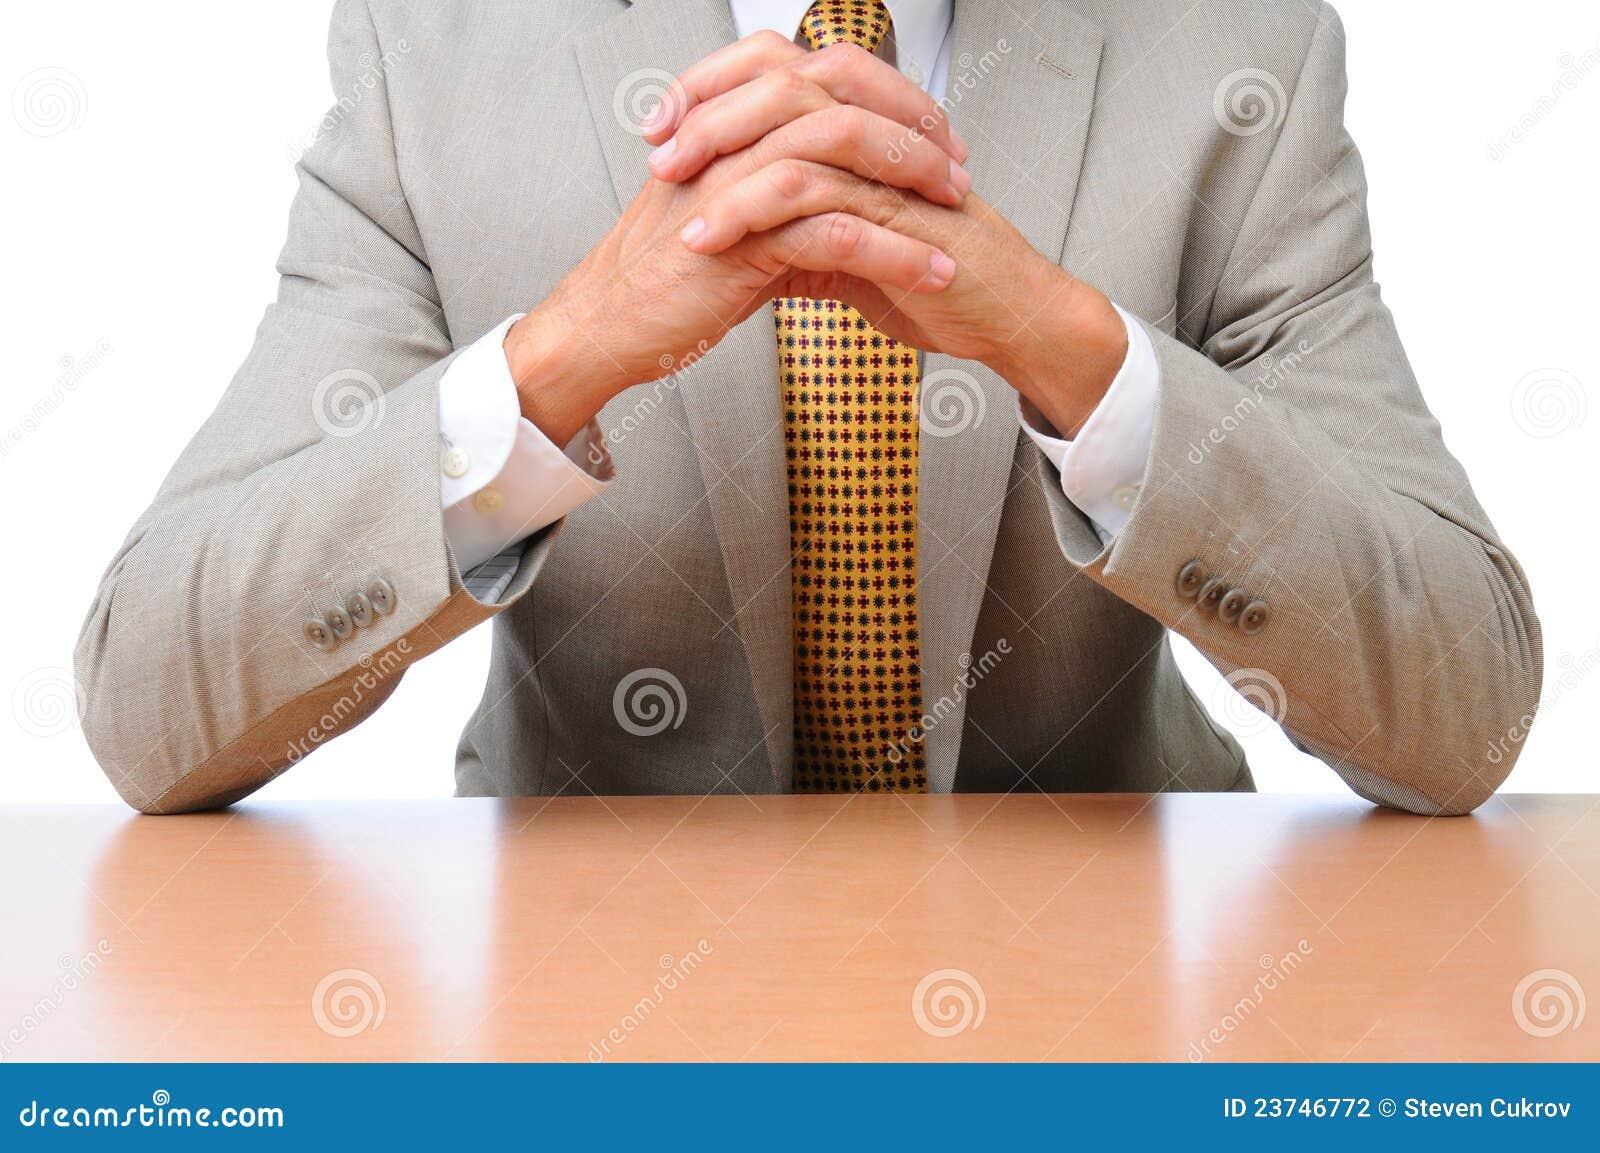 сосет довел рукой на столе тому